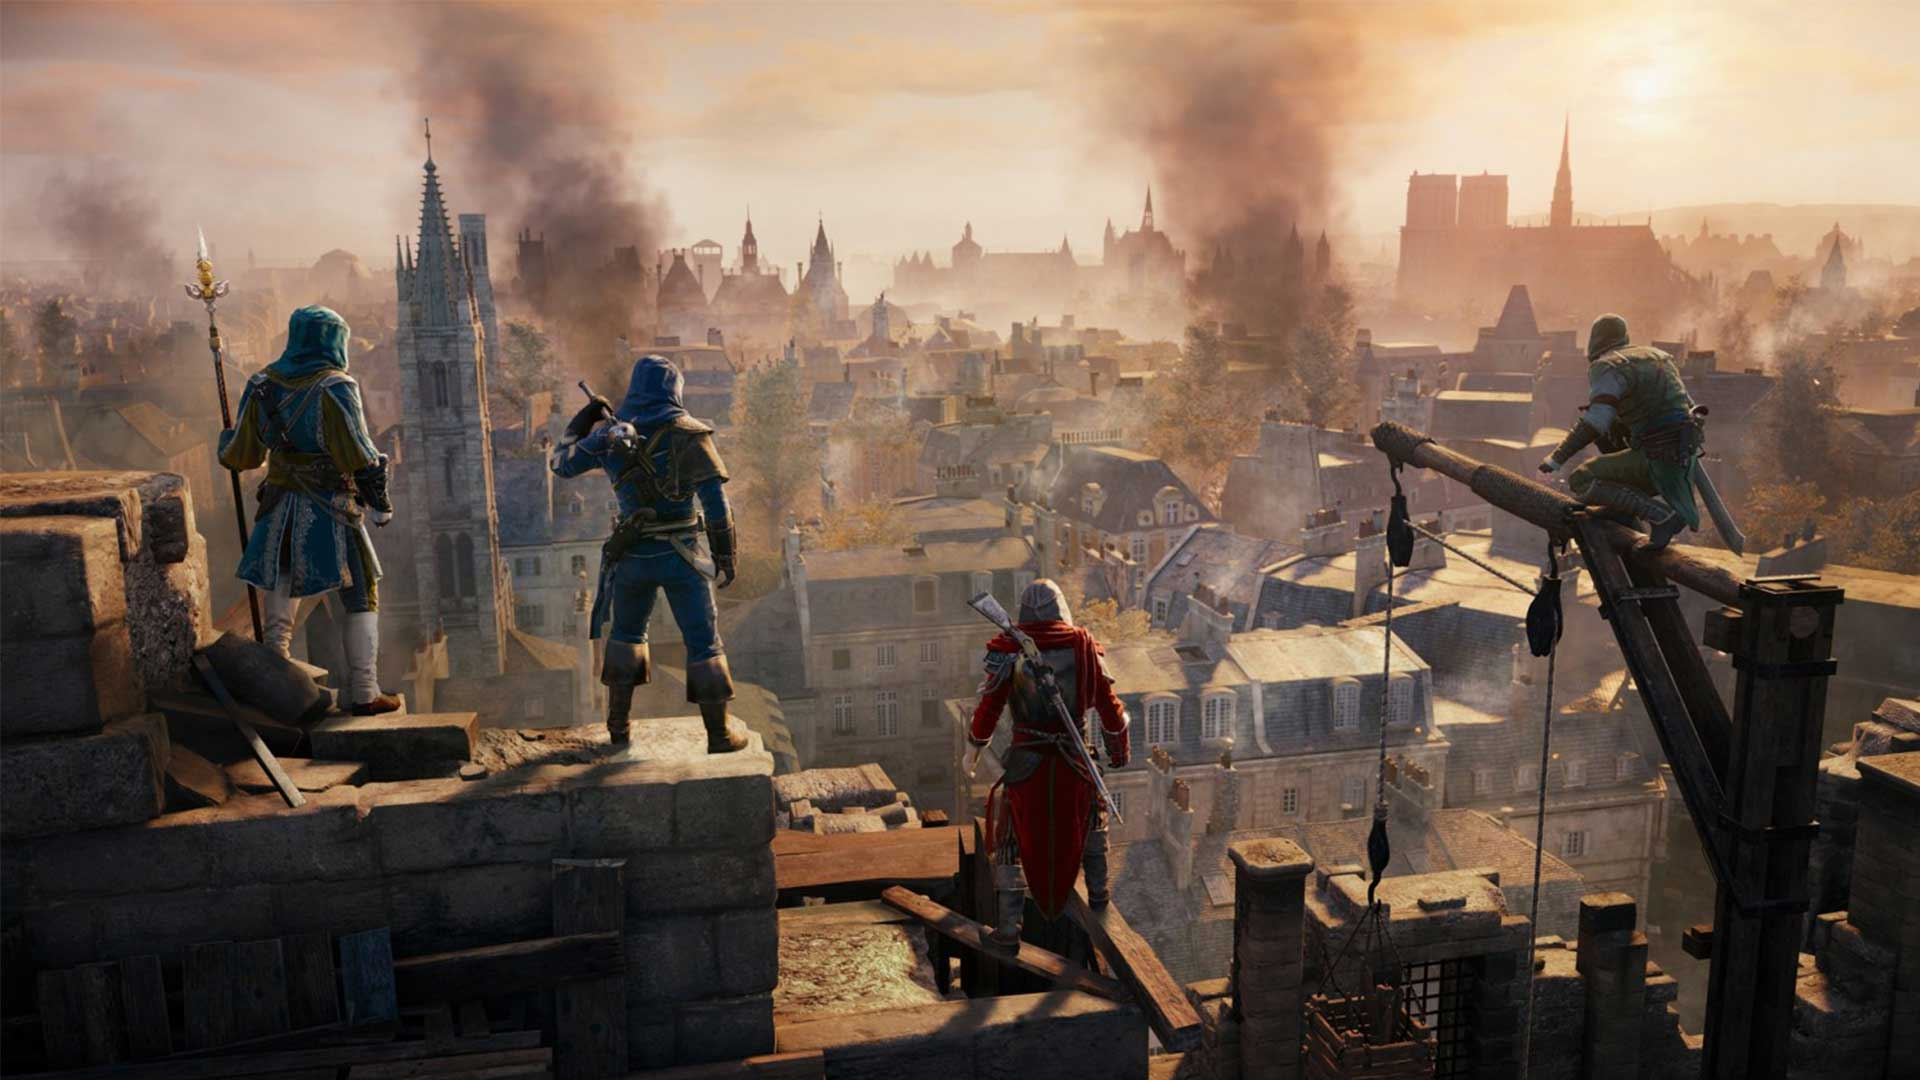 Руководство по загадке Нострадамуса в игре Assassin's Creed Unity (Венера)